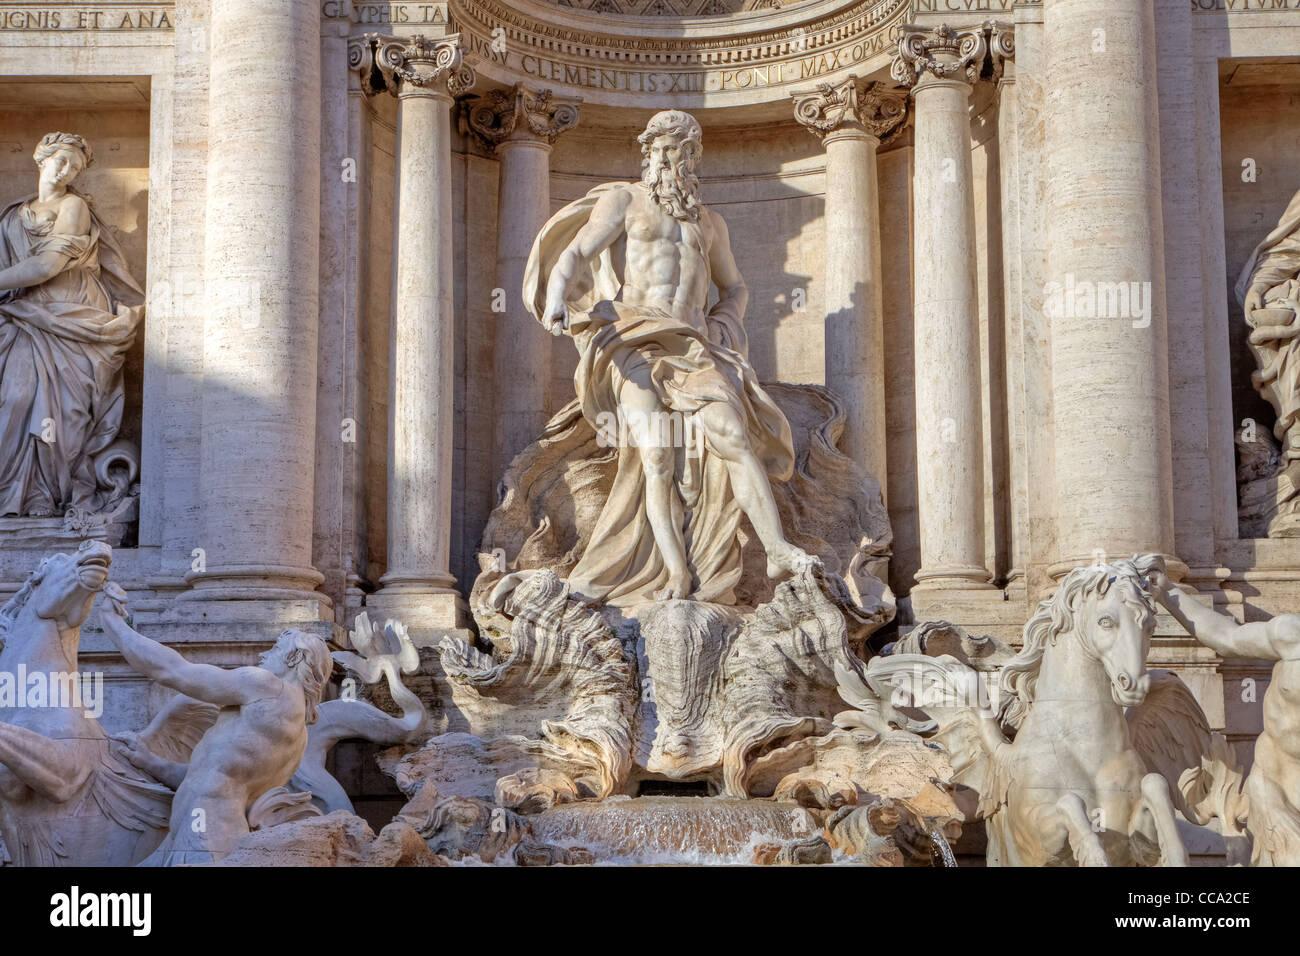 Trevi fountain in Rome - Stock Image